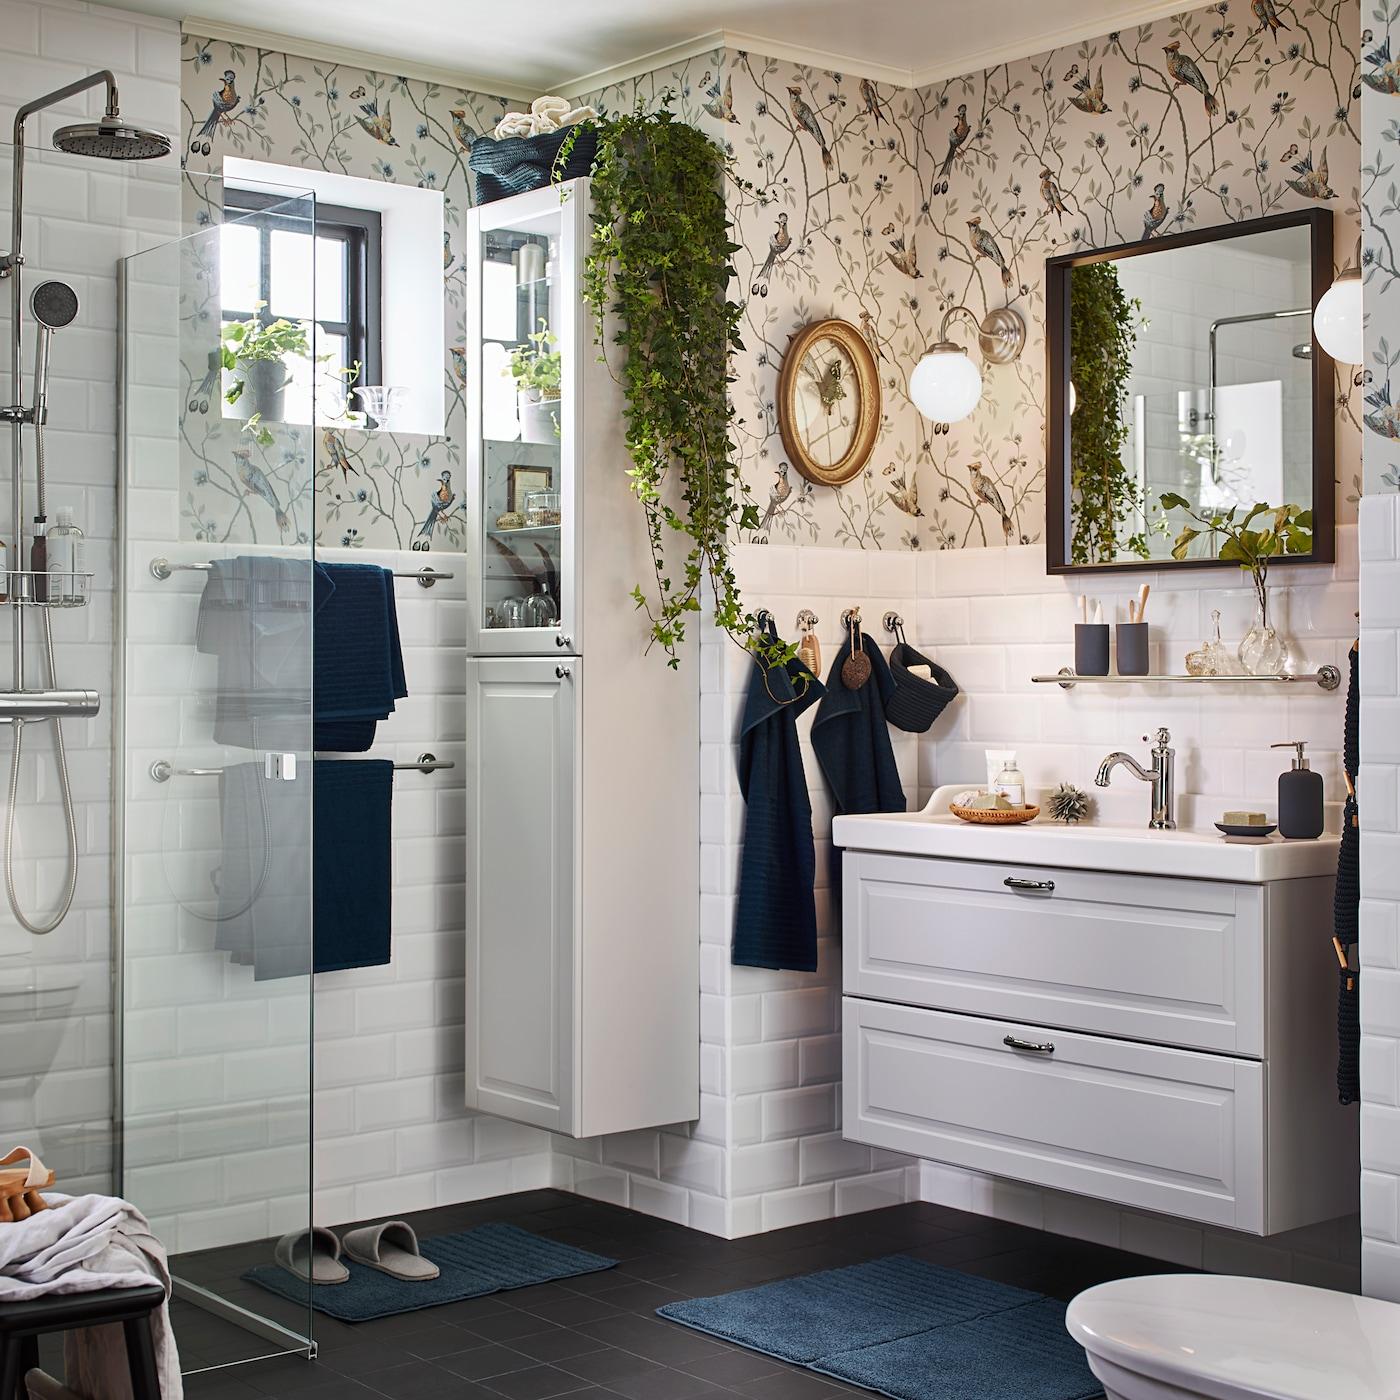 Bathroom Design Gallery  IKEA Egypt - IKEA